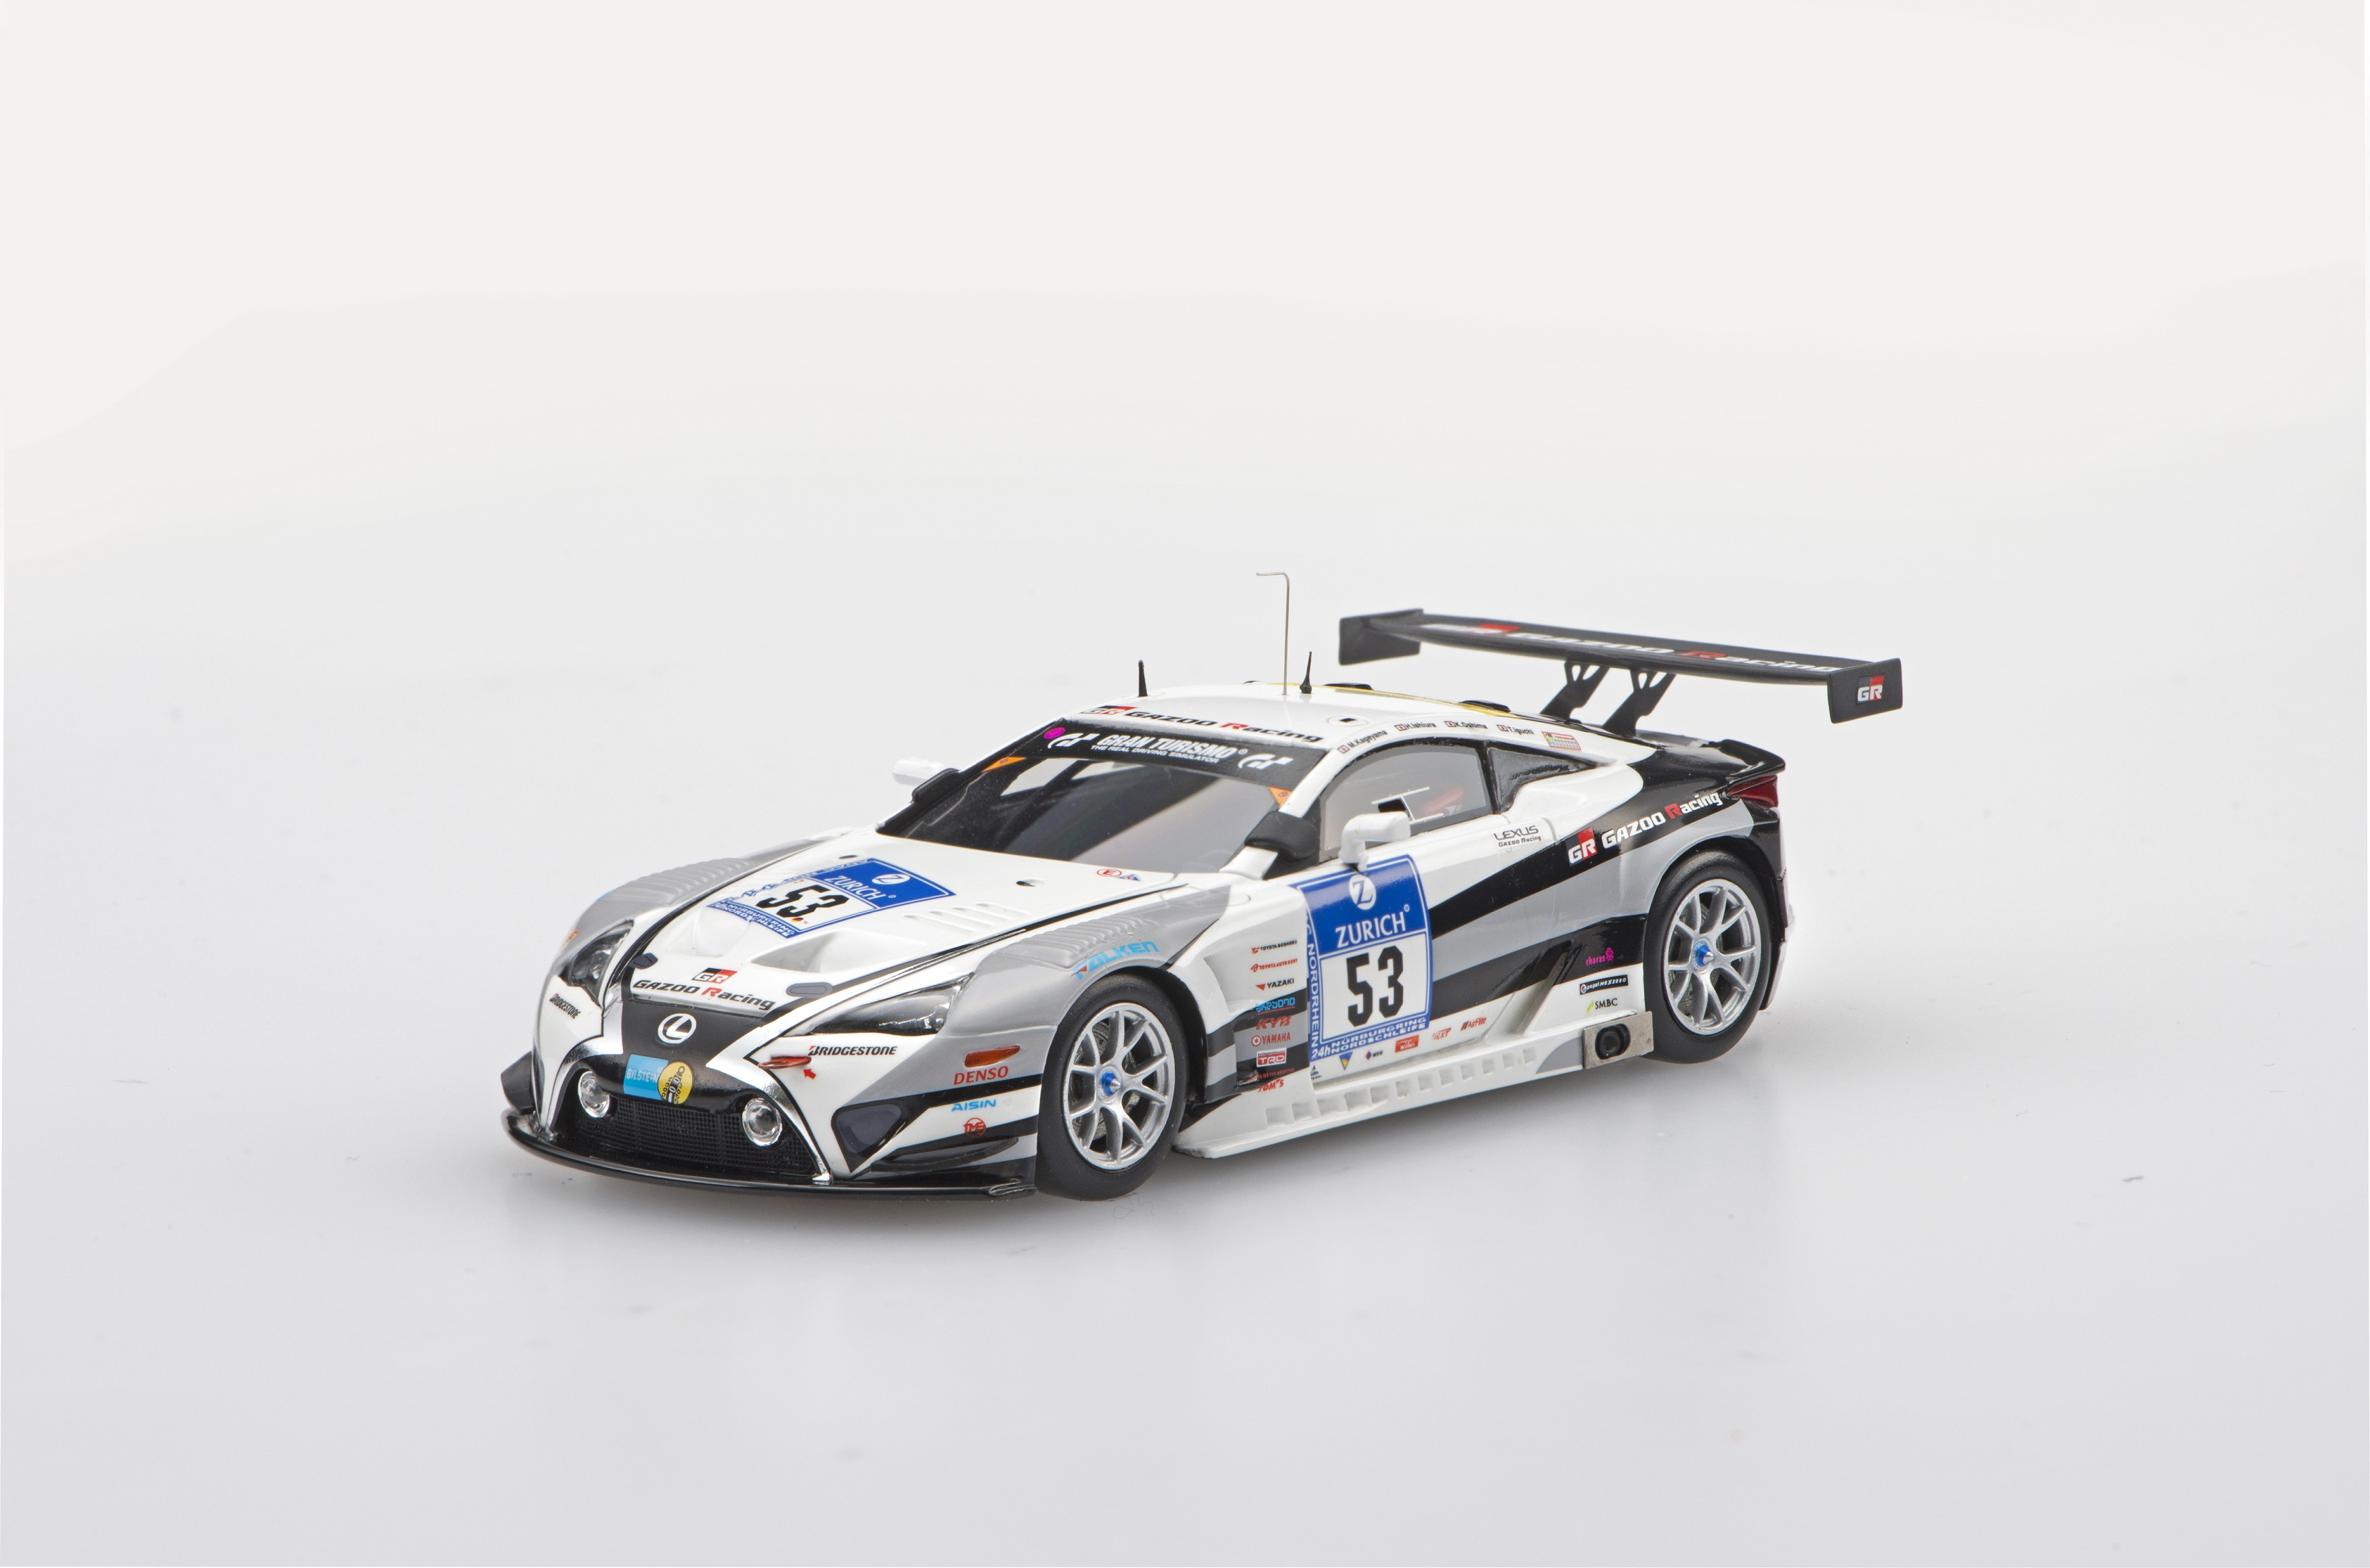 ☆予約品☆【45330】LEXUS LFA Code X Nurburgring 24-hour Race 2015 No53 【RESIN】